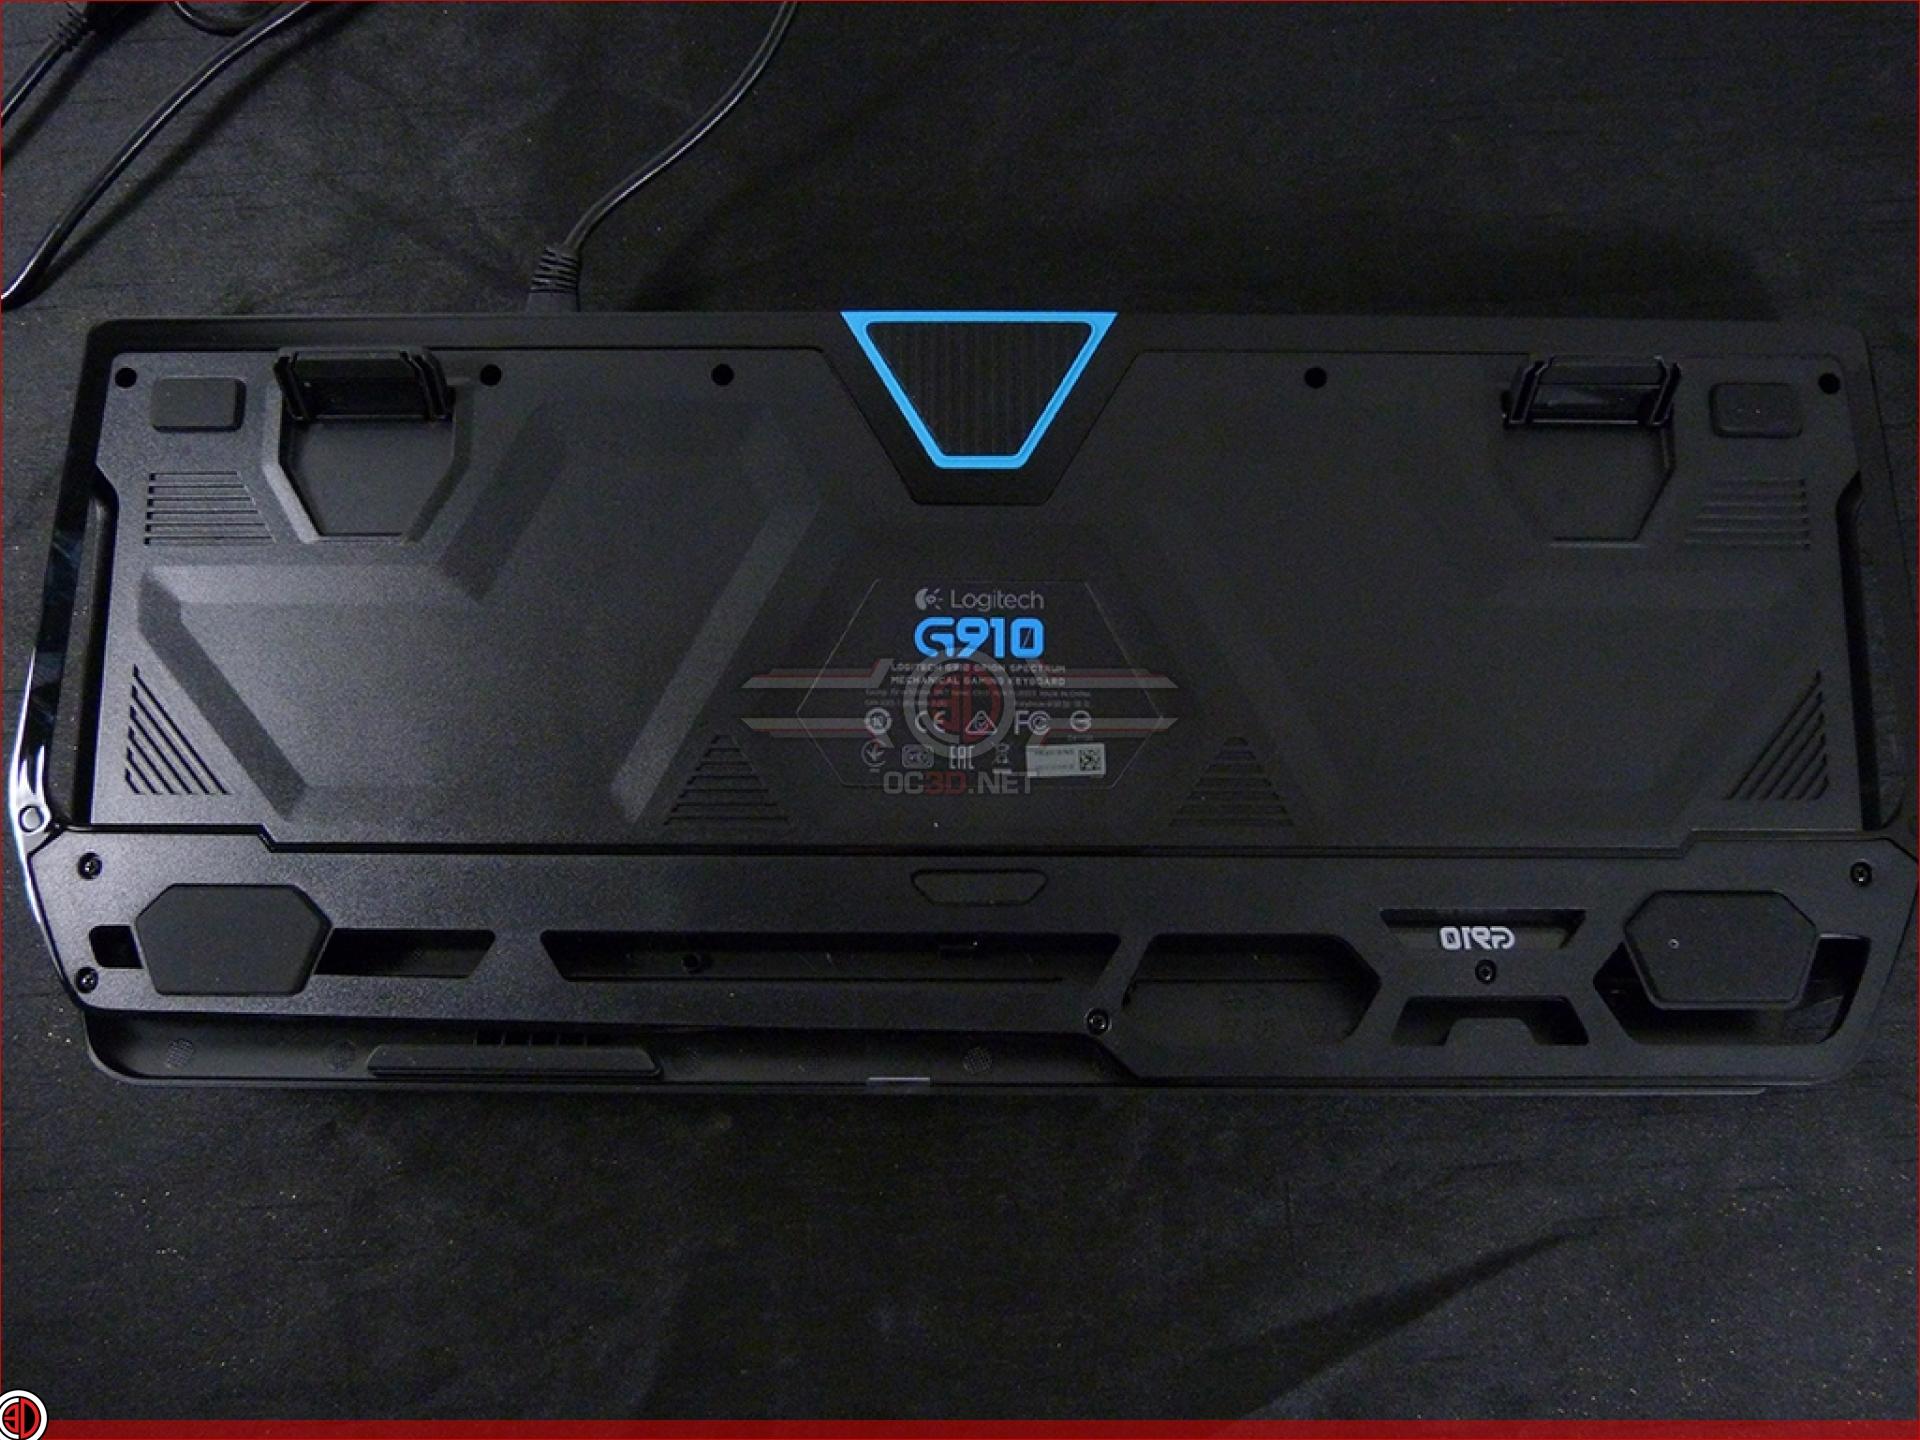 Logitech G910 Orion Spectrum Review   Up Close   Input